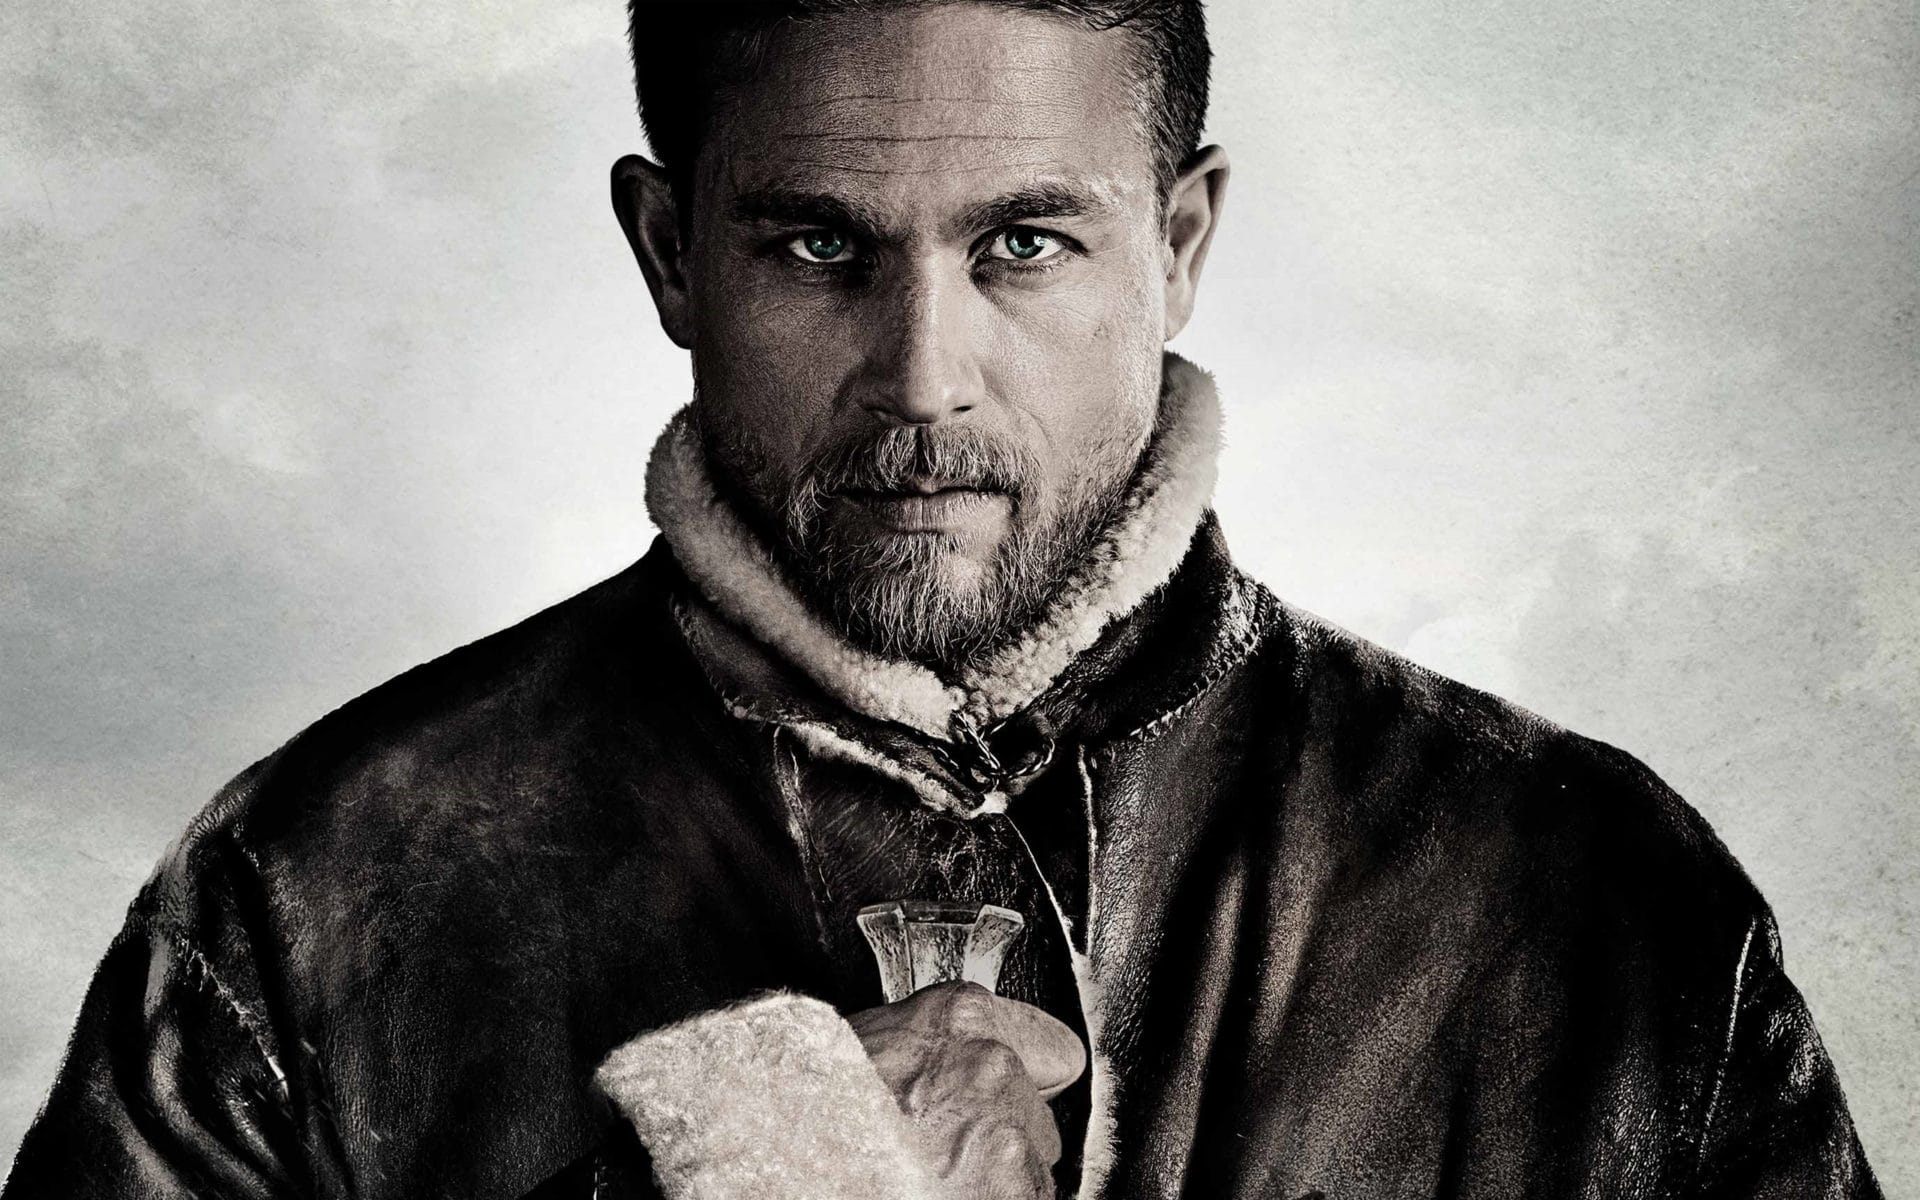 king_arthur_legend_of_the_sword-wide1 King Arthur: Legend of the Sword